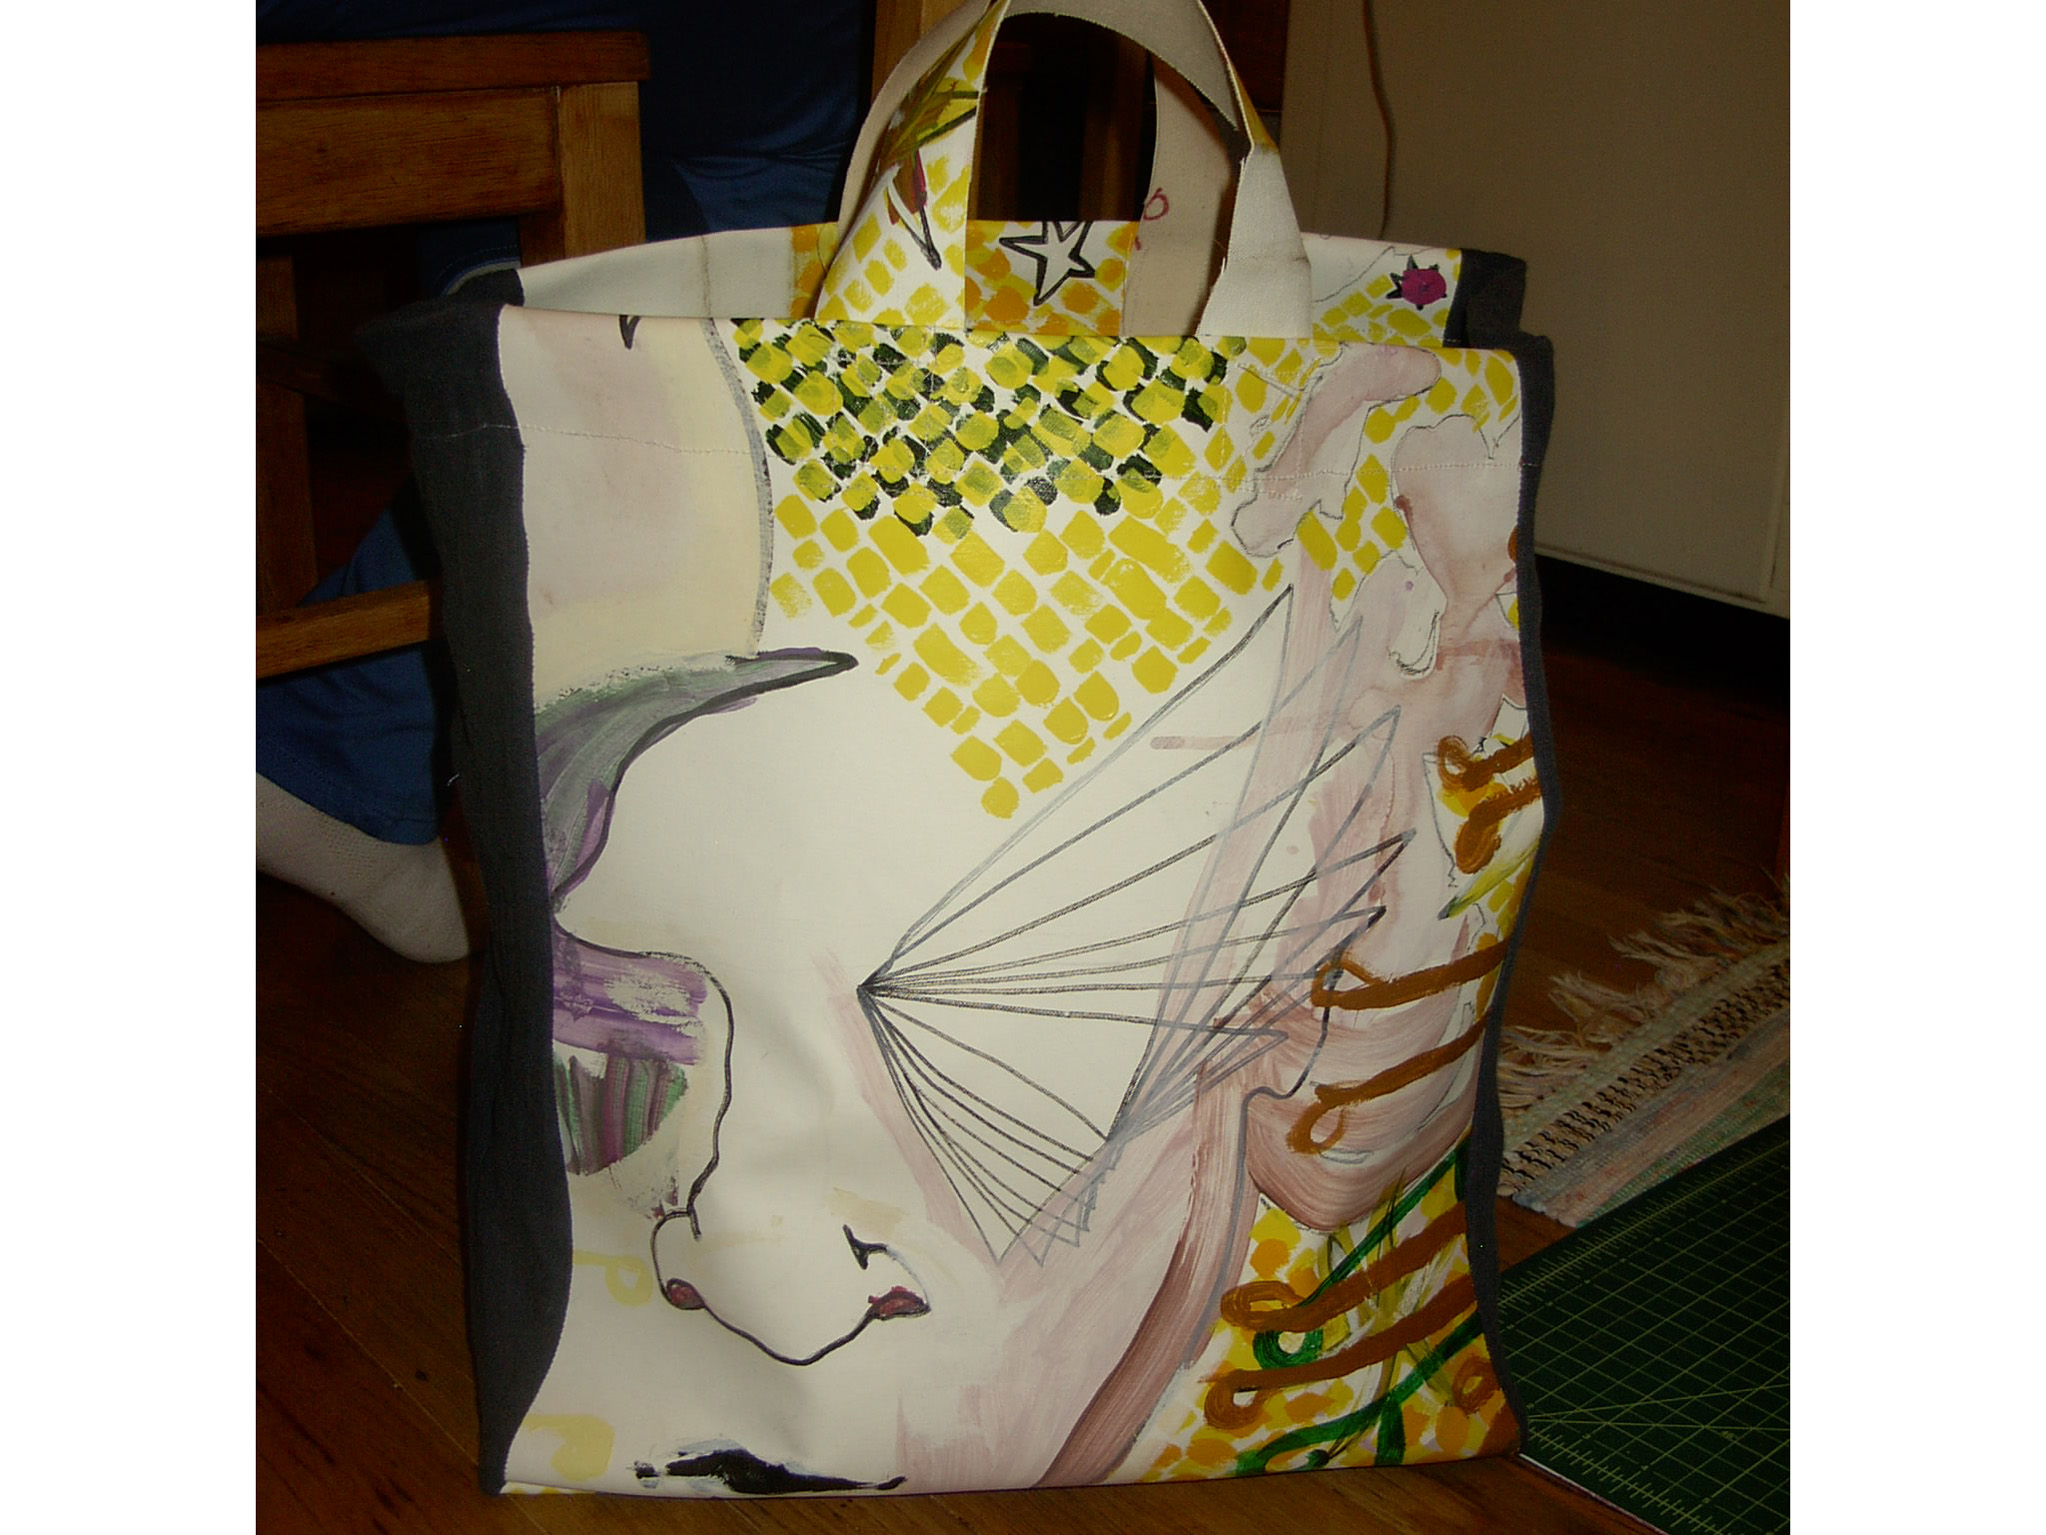 Art: it's my bag.